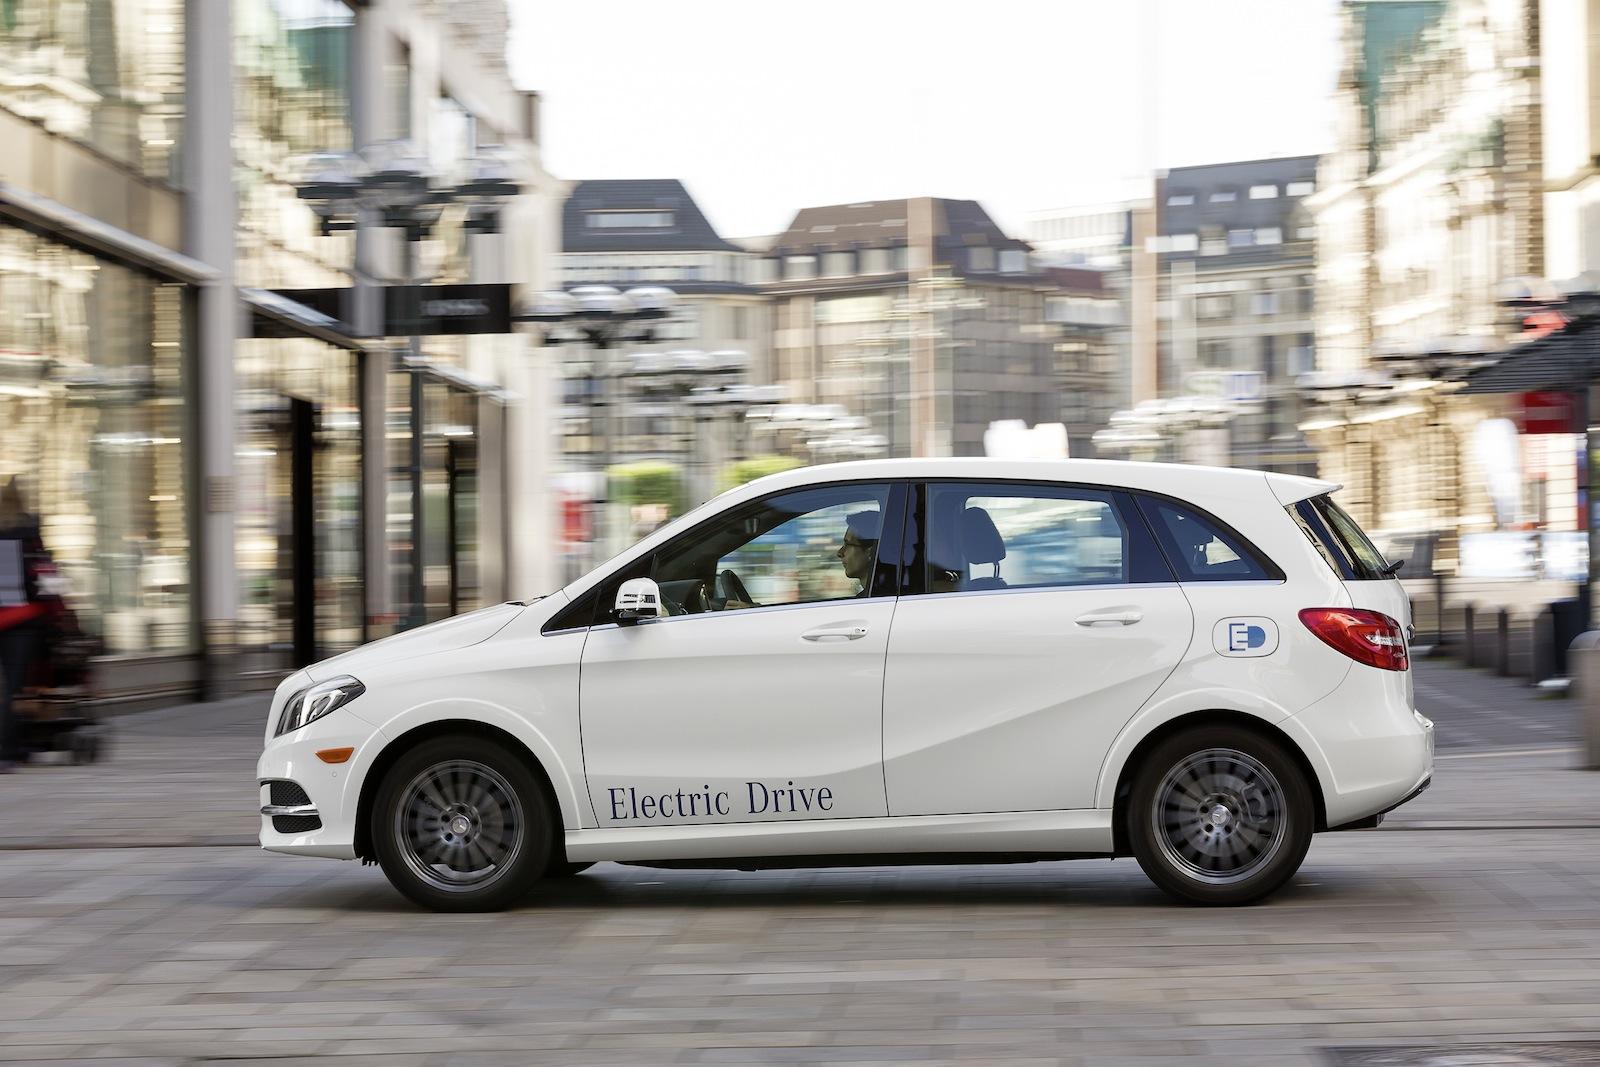 Mercedes benz defends electric vehicle strategy versus bmw for Mercedes benz brands